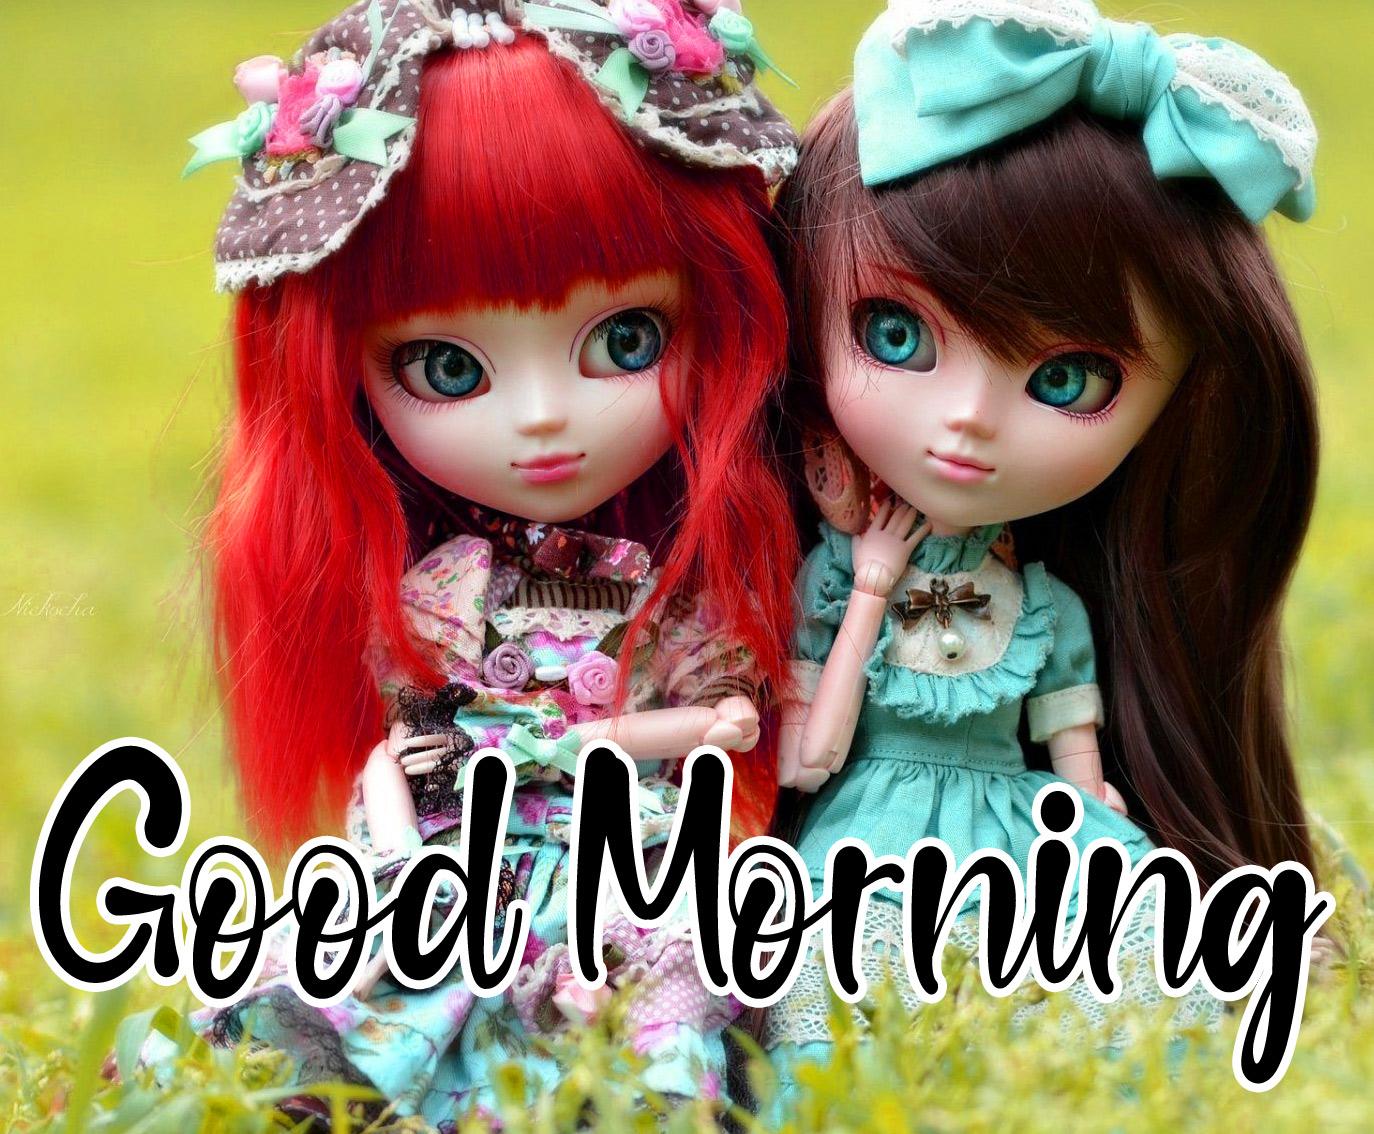 good morning Images for girls 14